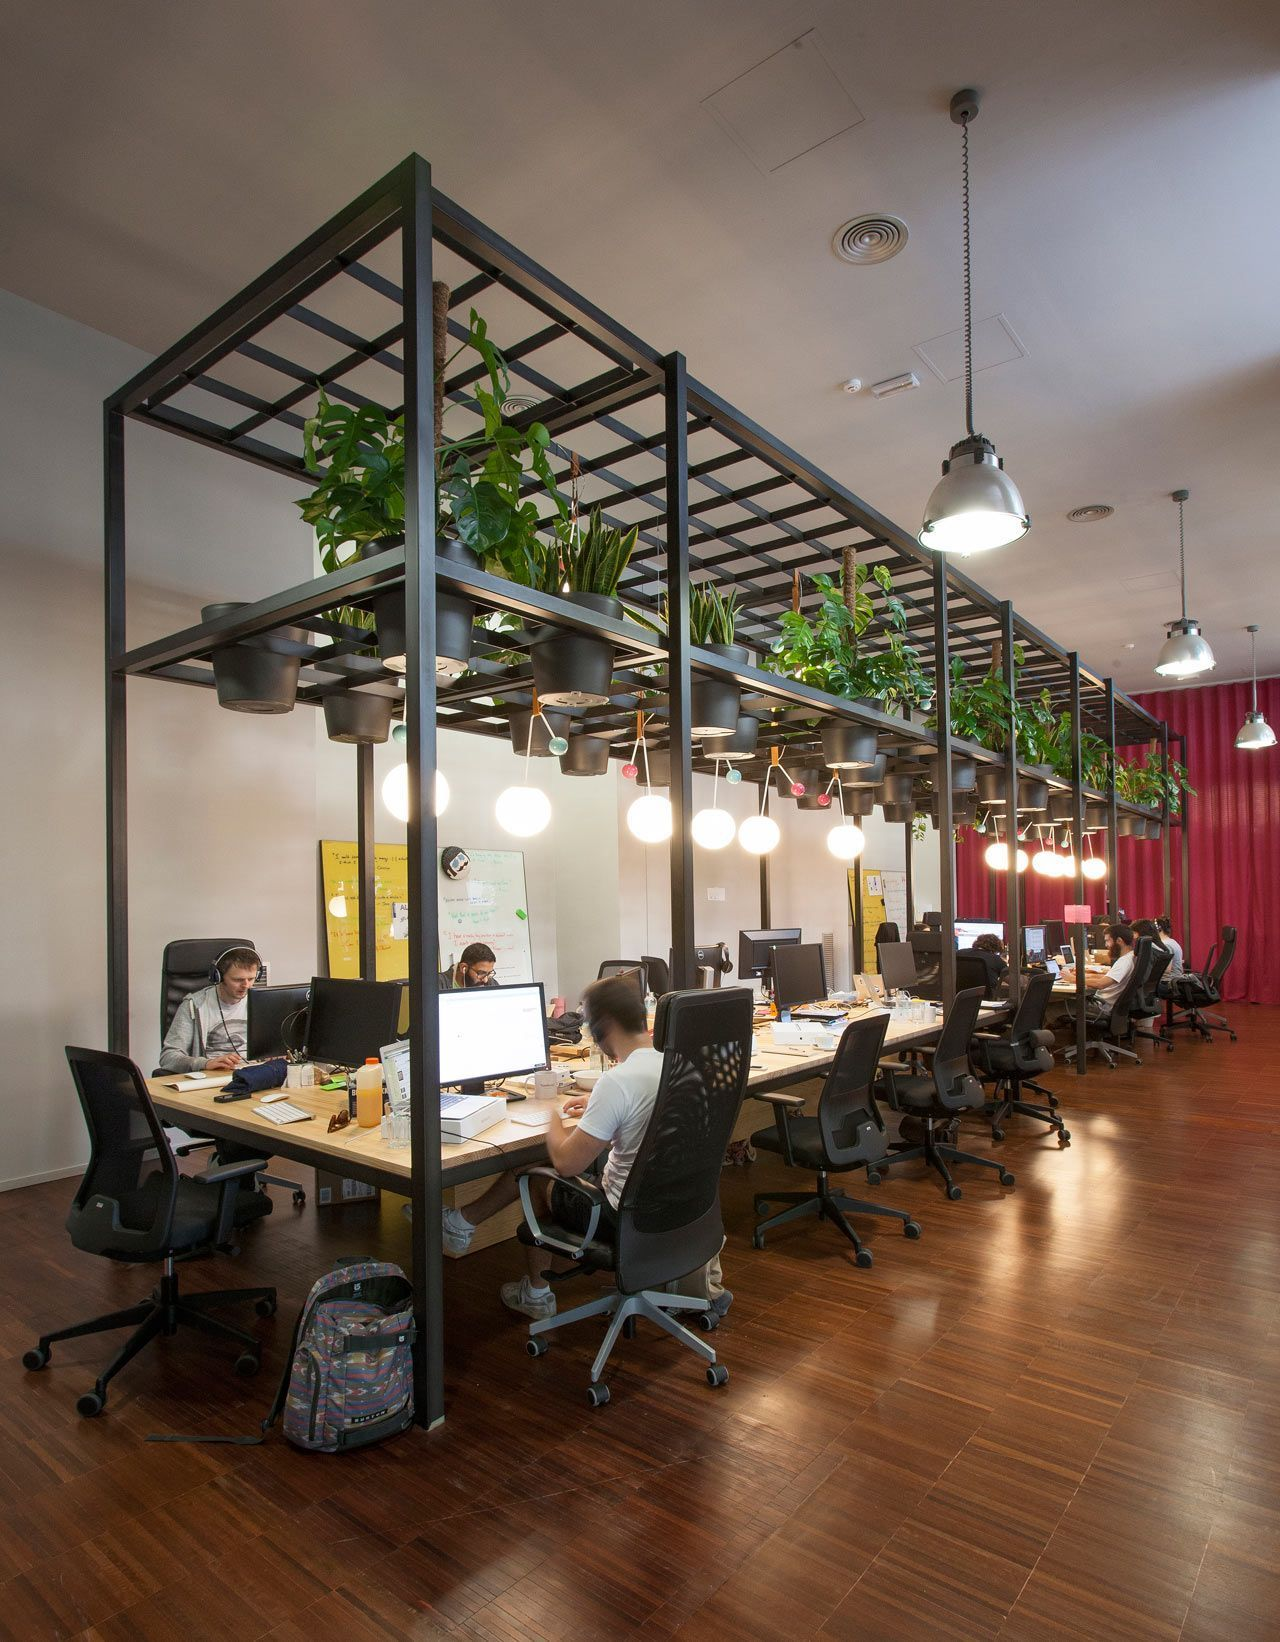 Typeform office by Lagranja Design   Studio   Pinterest   Office ...